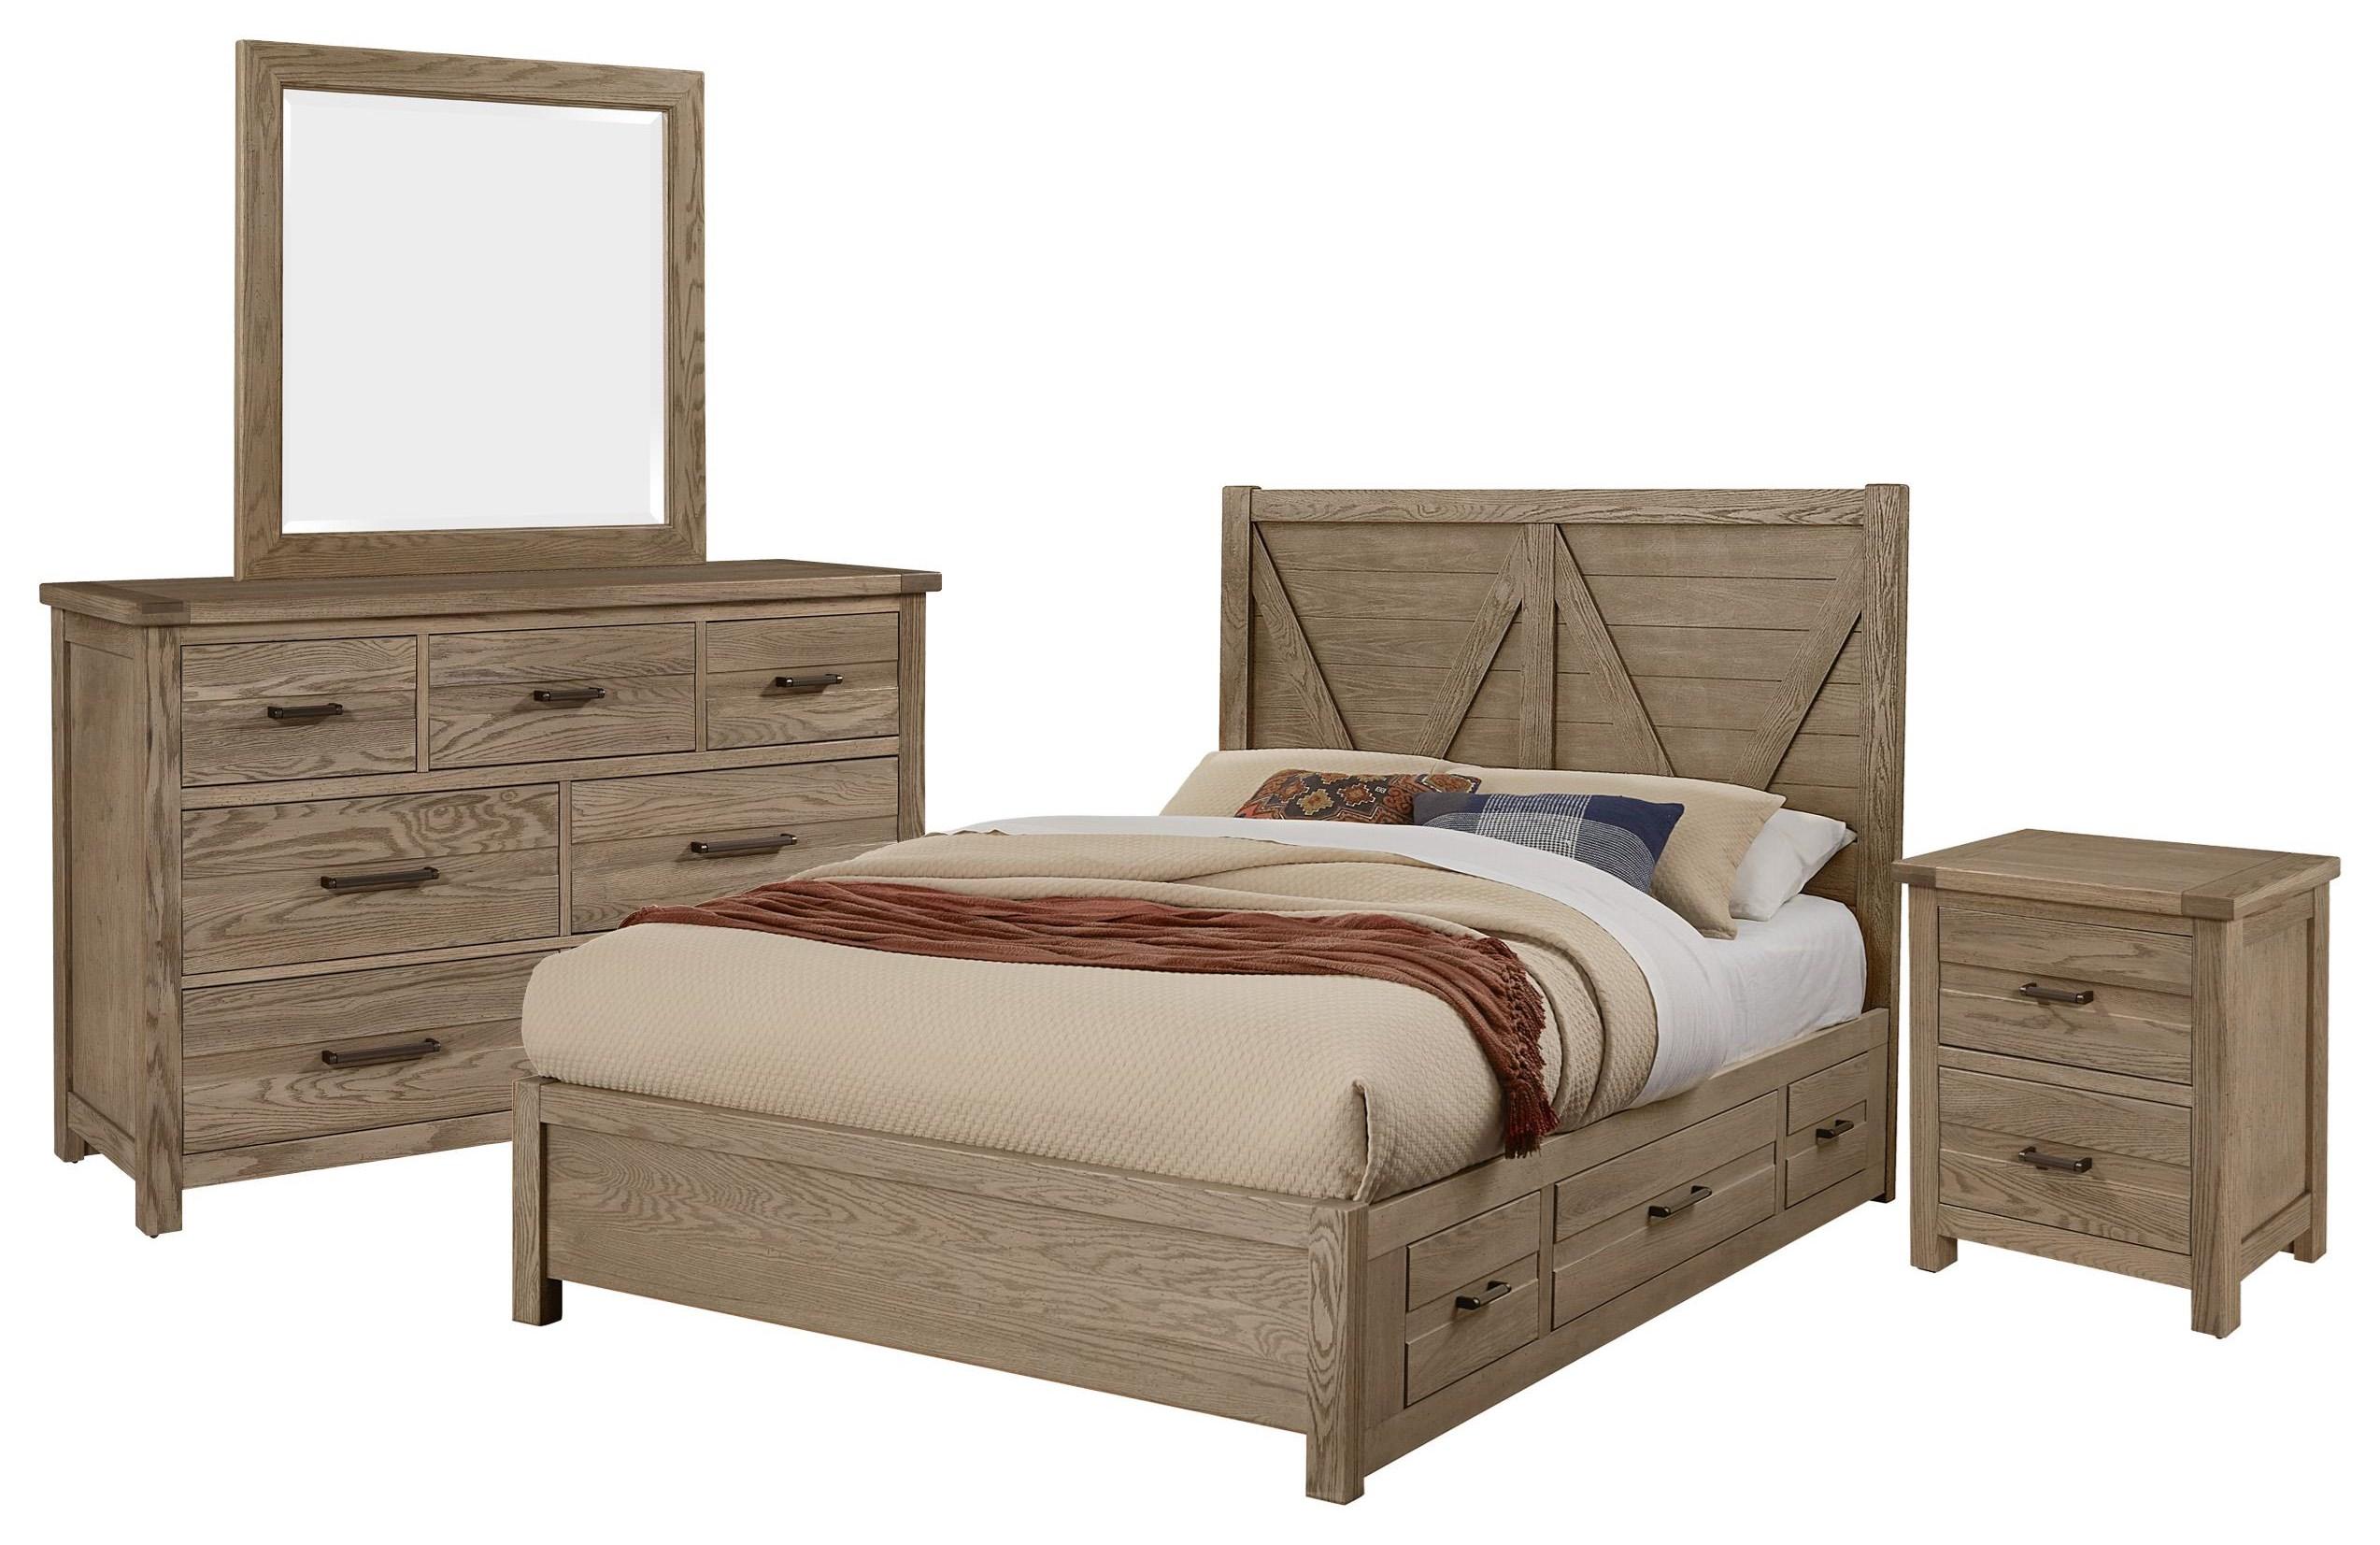 Highland King V BED 2 SIDE, Dresser, Mirror, Nightst by Vaughan Bassett at Johnny Janosik